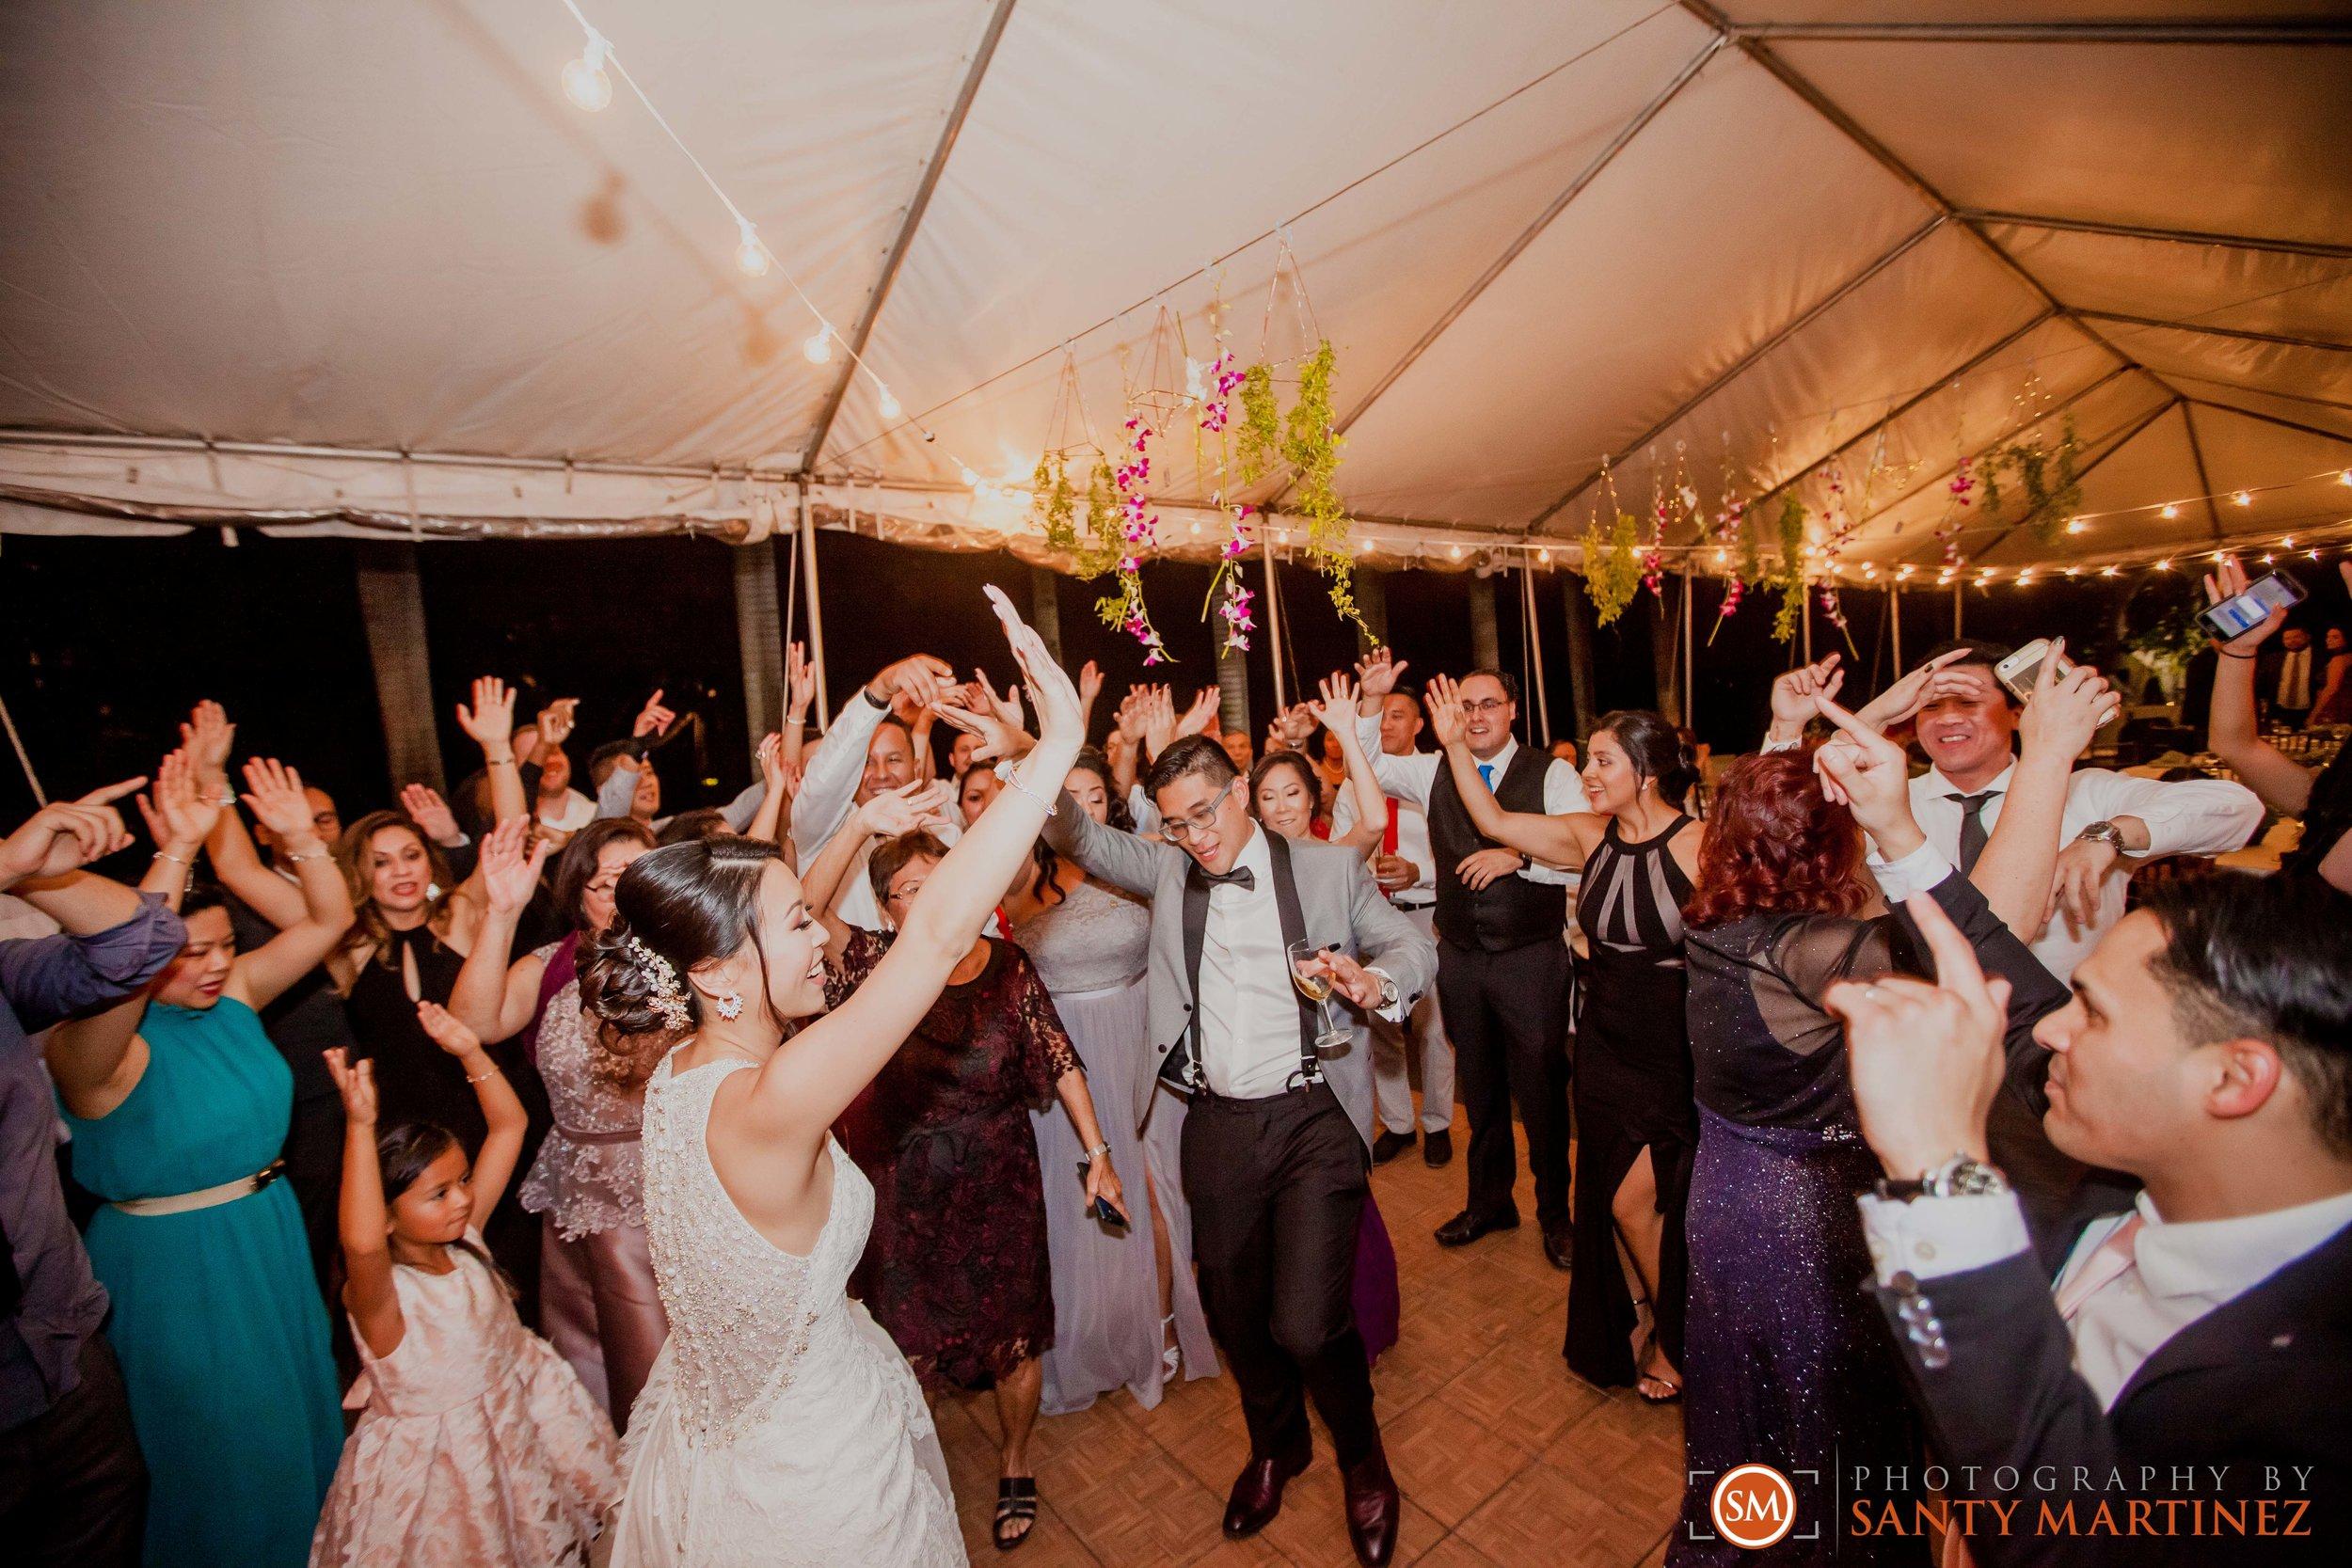 Wedding Bonnet House - Photography by Santy Martinez-44.jpg